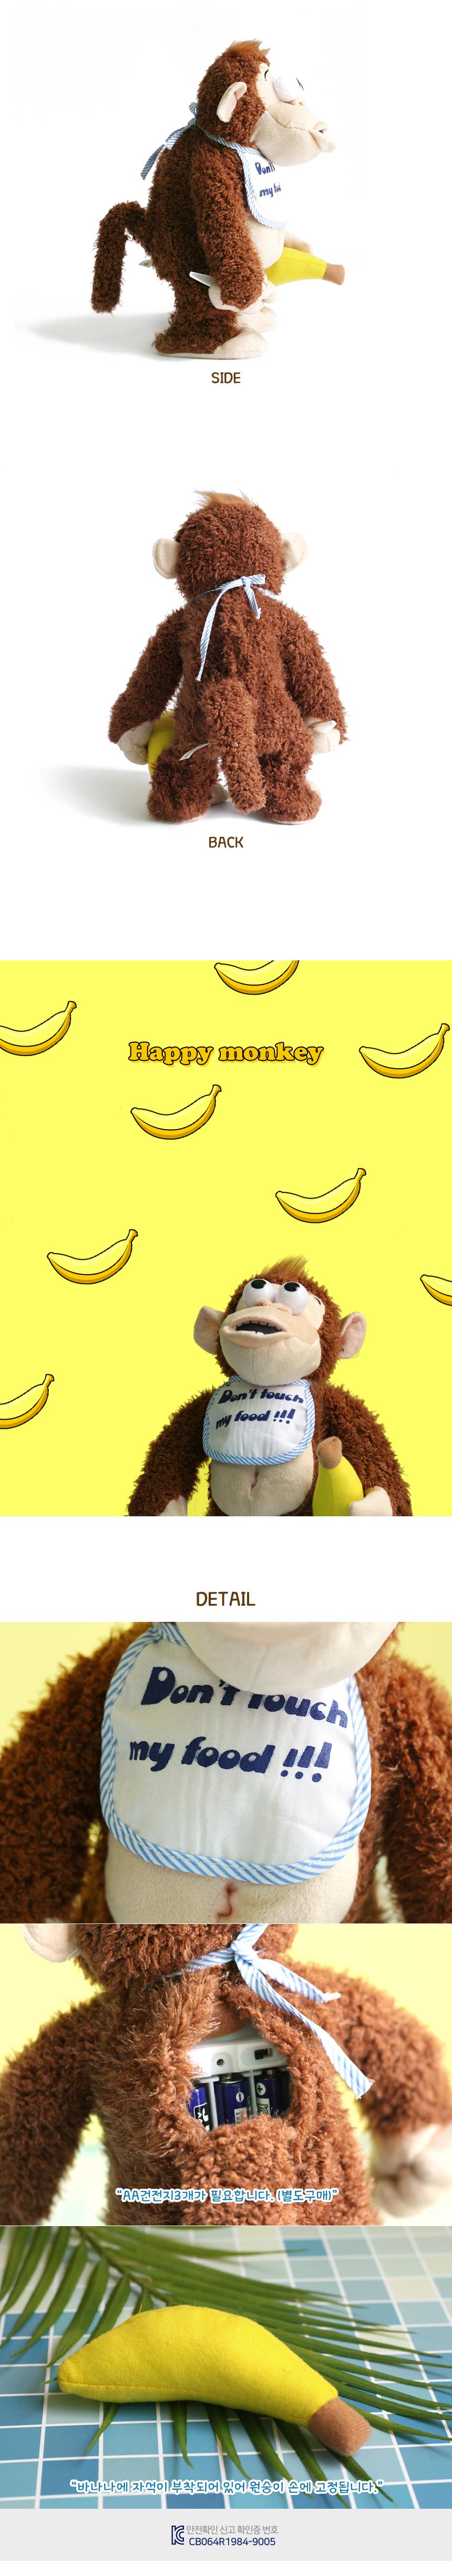 crying_monkey2.jpg